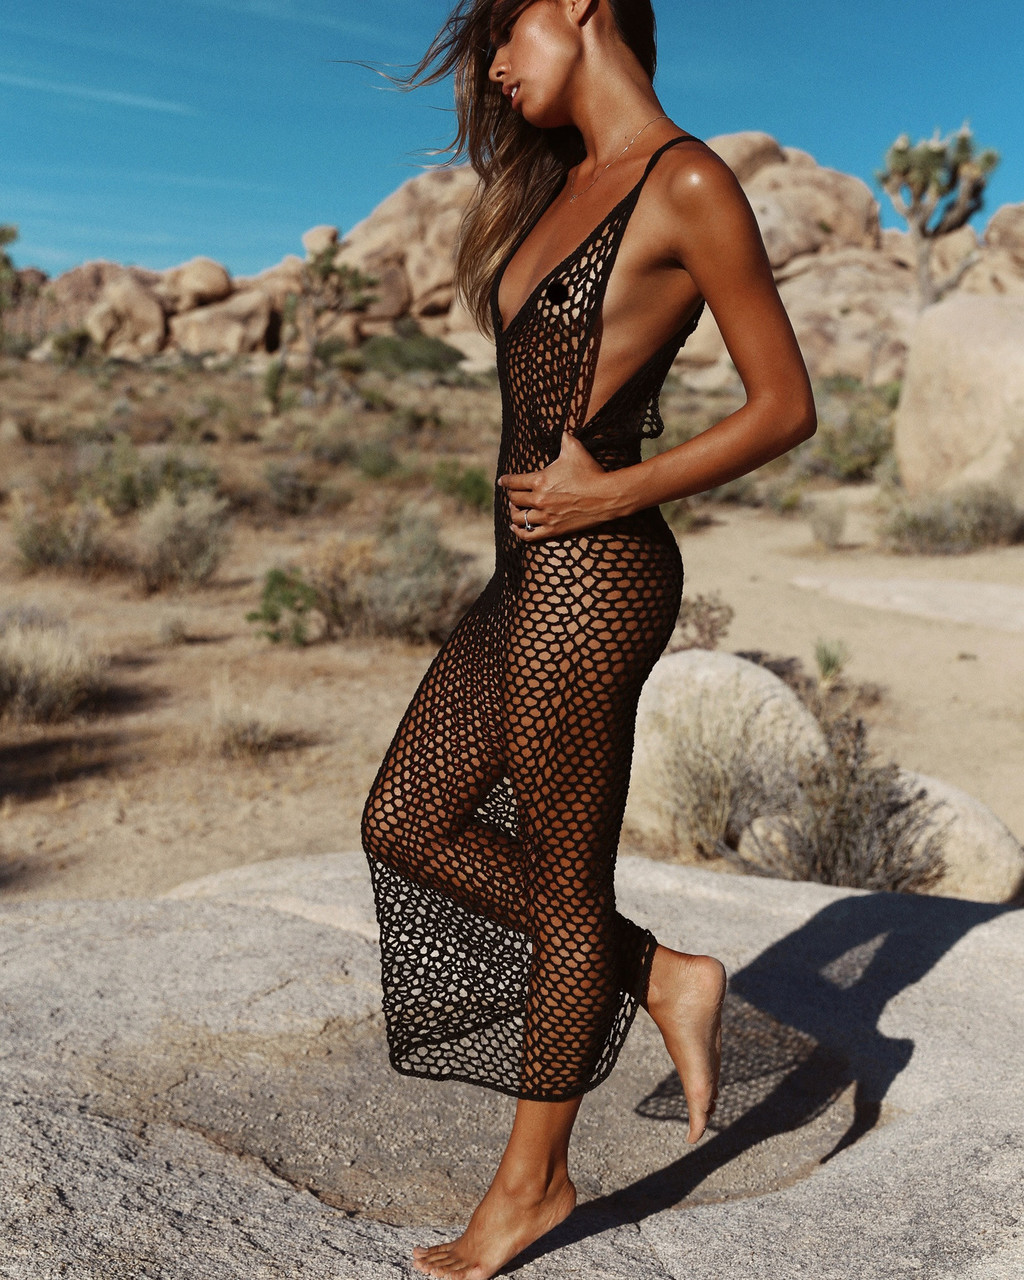 d40d934e19 Crochet-Long-dress-vestido-ganchillo-Women-beach-bikini-cover-ups-Sexy-Mesh- Swimsuit-Bathing-Suit-Pareo__53069.1524984859.jpg?c=2&imbypass=on